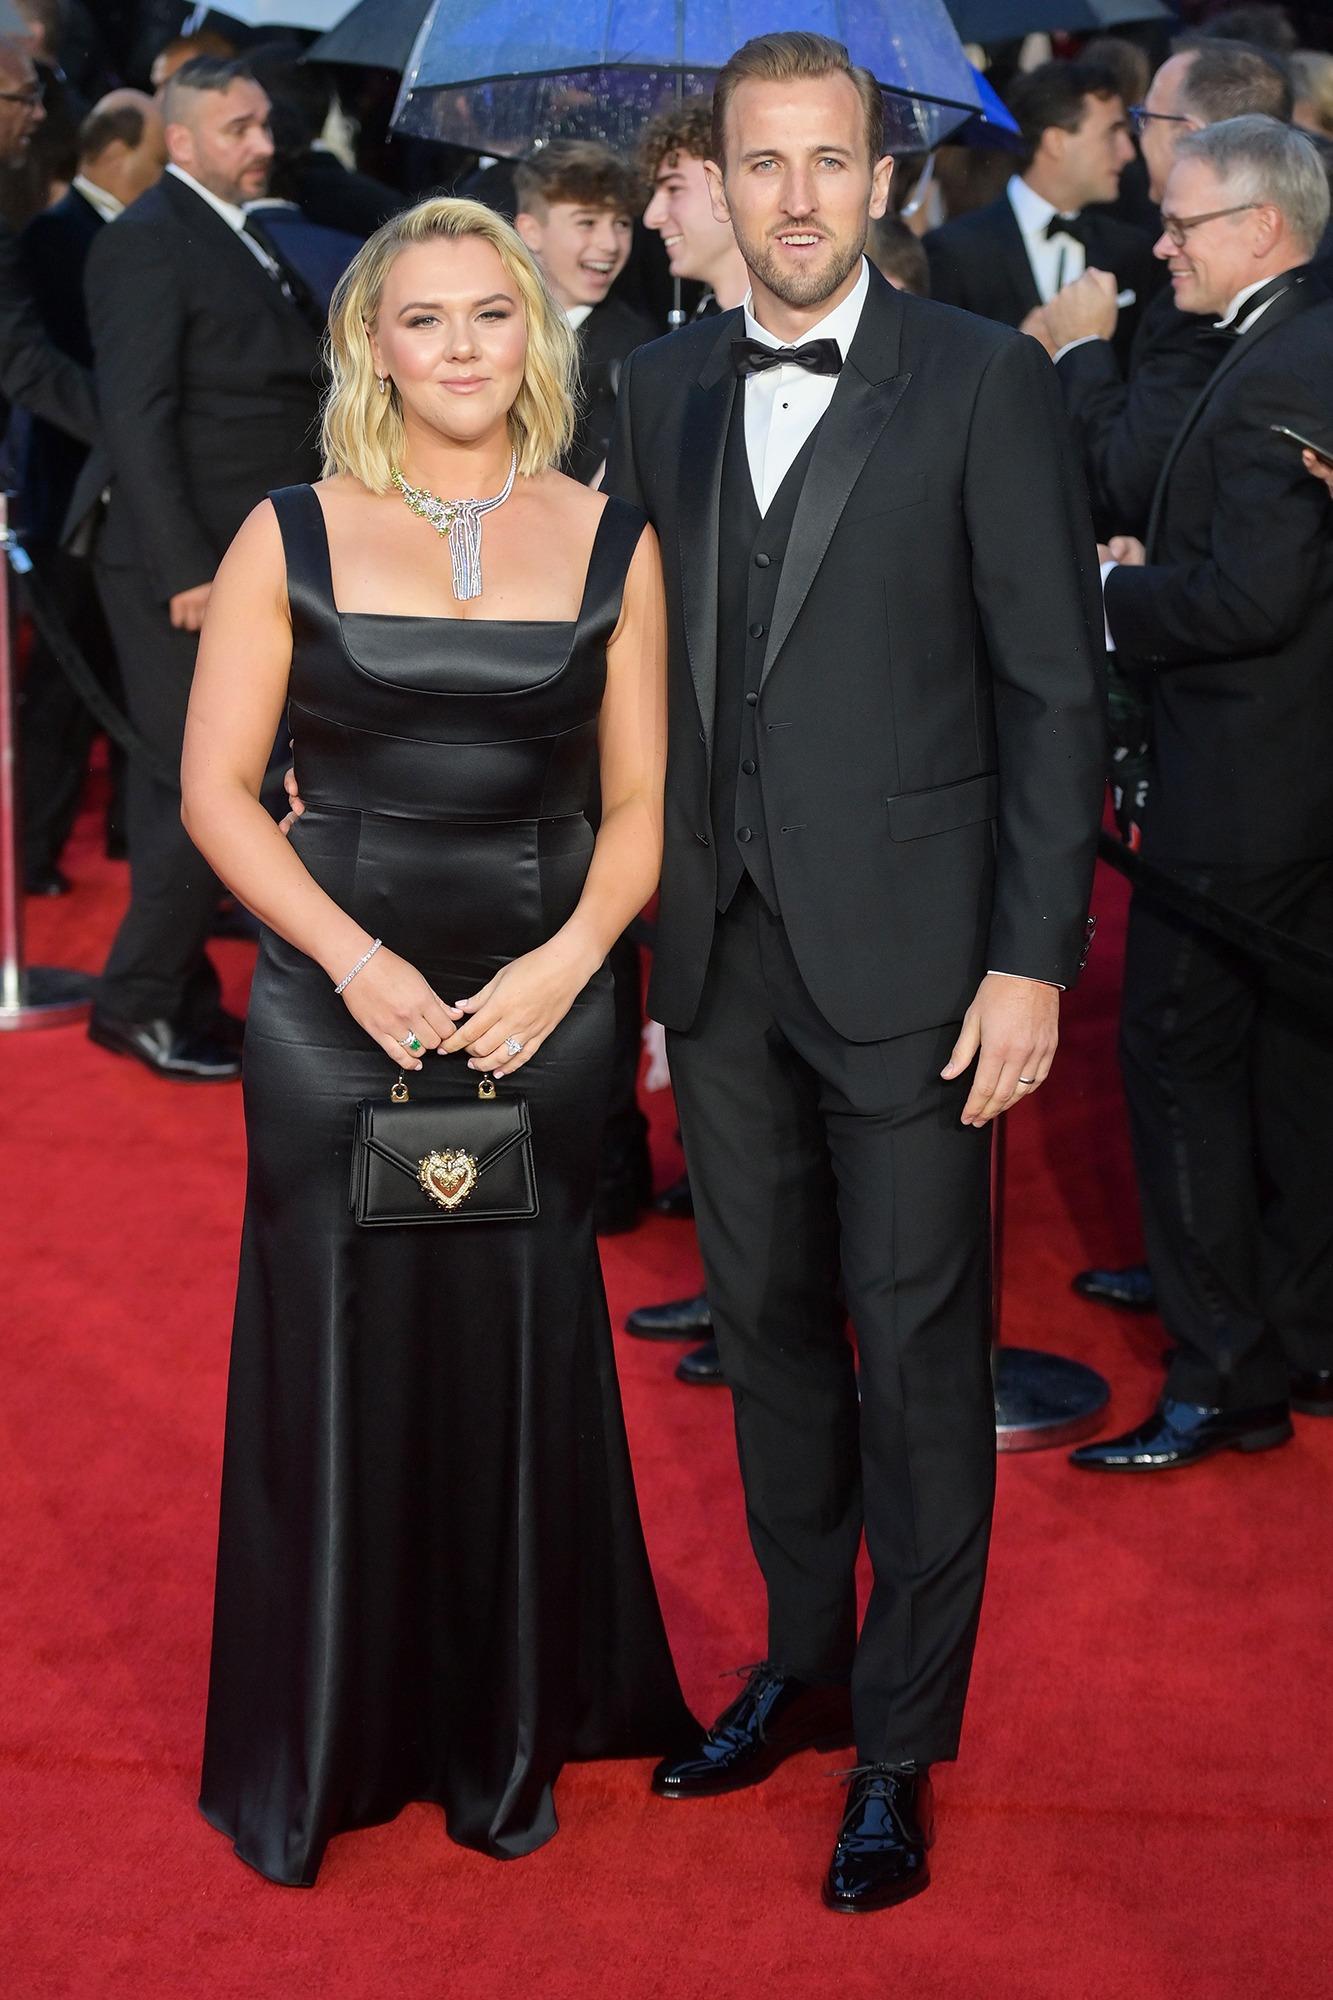 Vợ chồng cầu thủ Harry Kane - Katie Goodland.